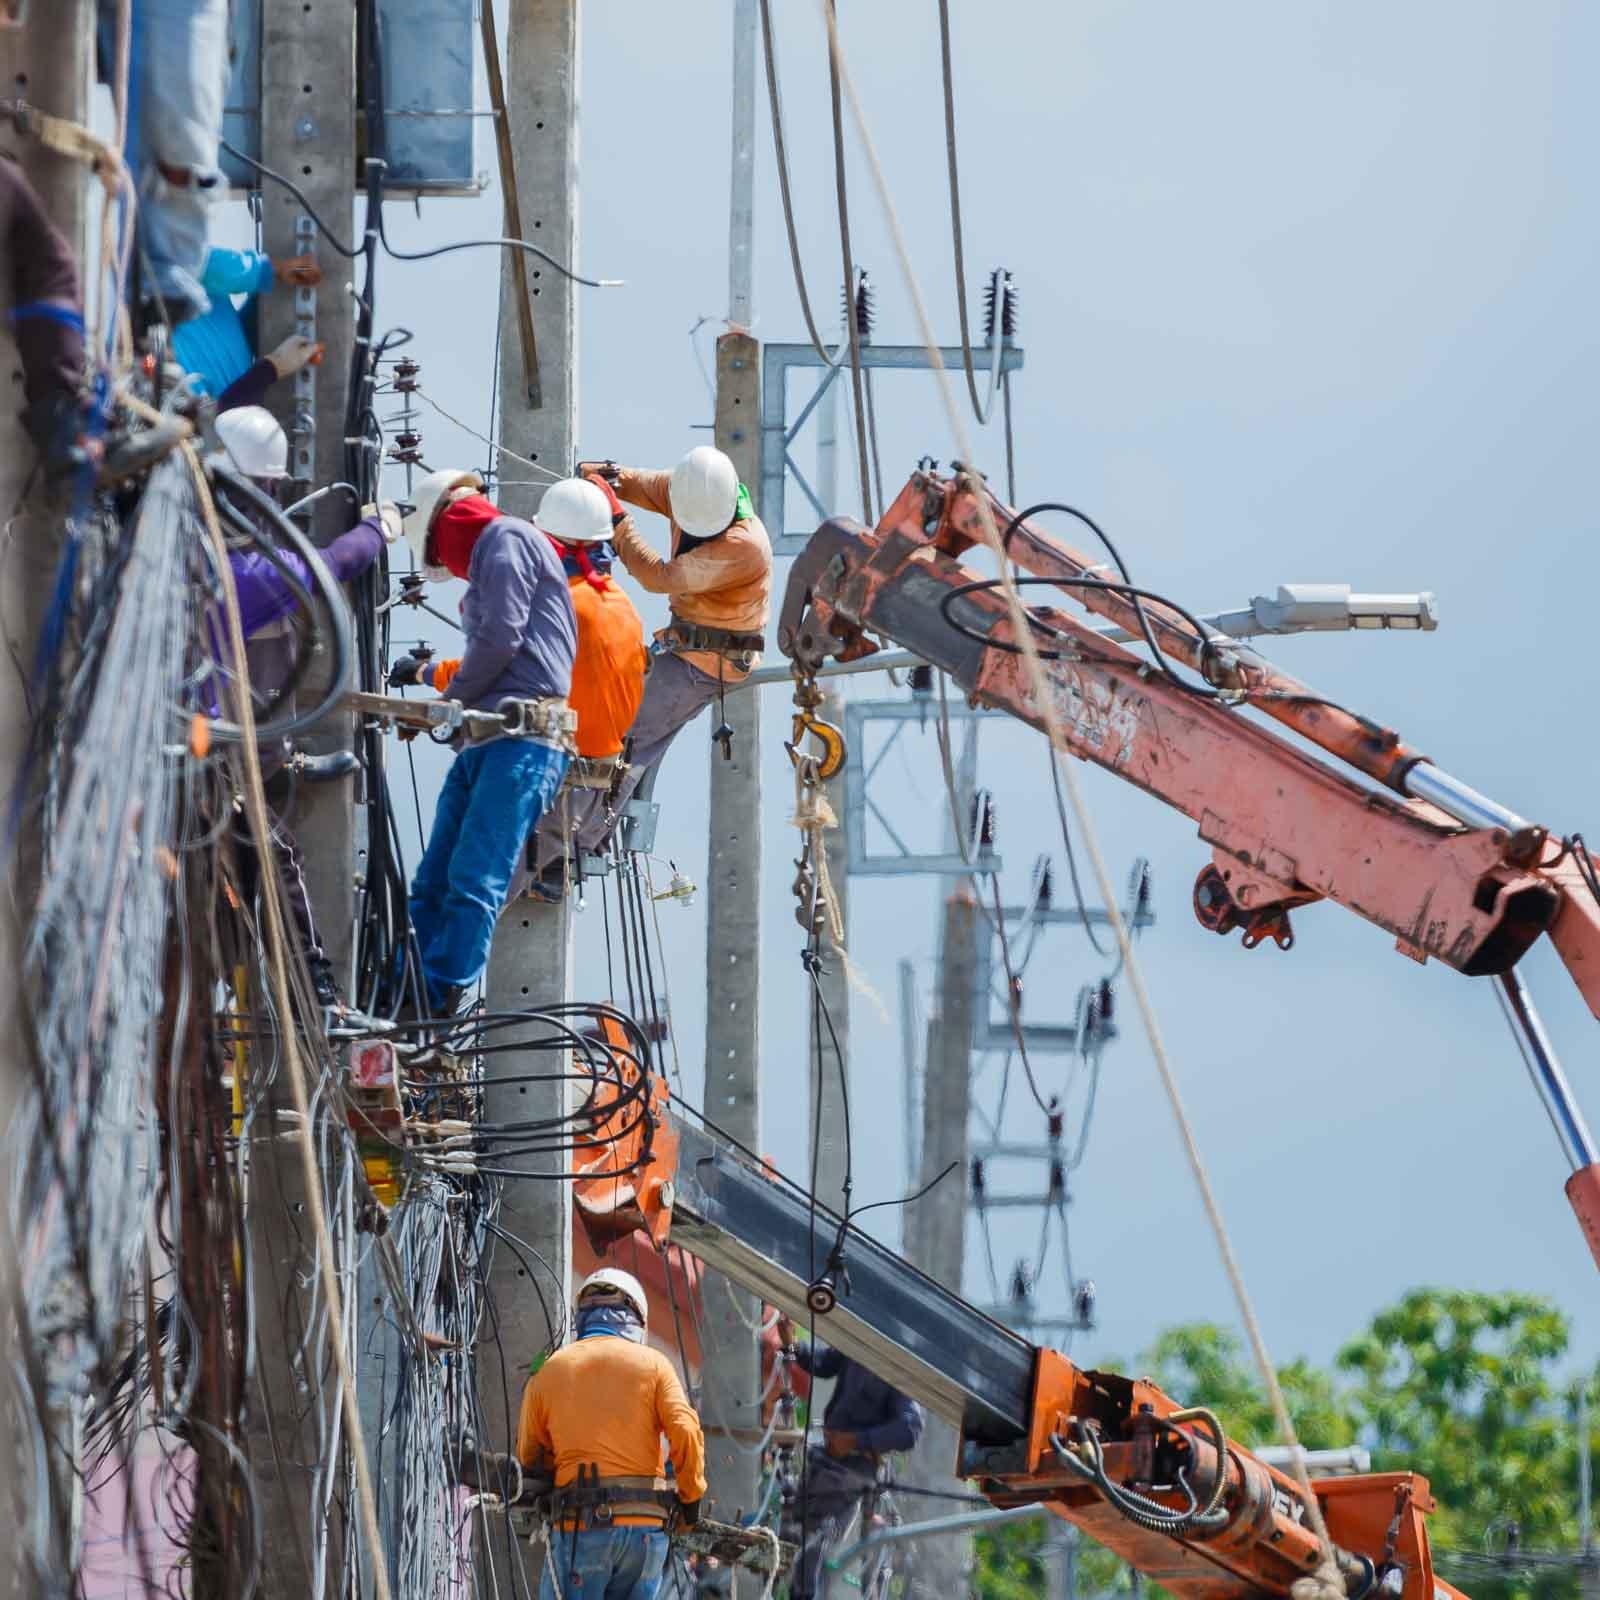 risk-safety-planning-operation-urbint-worker-safety